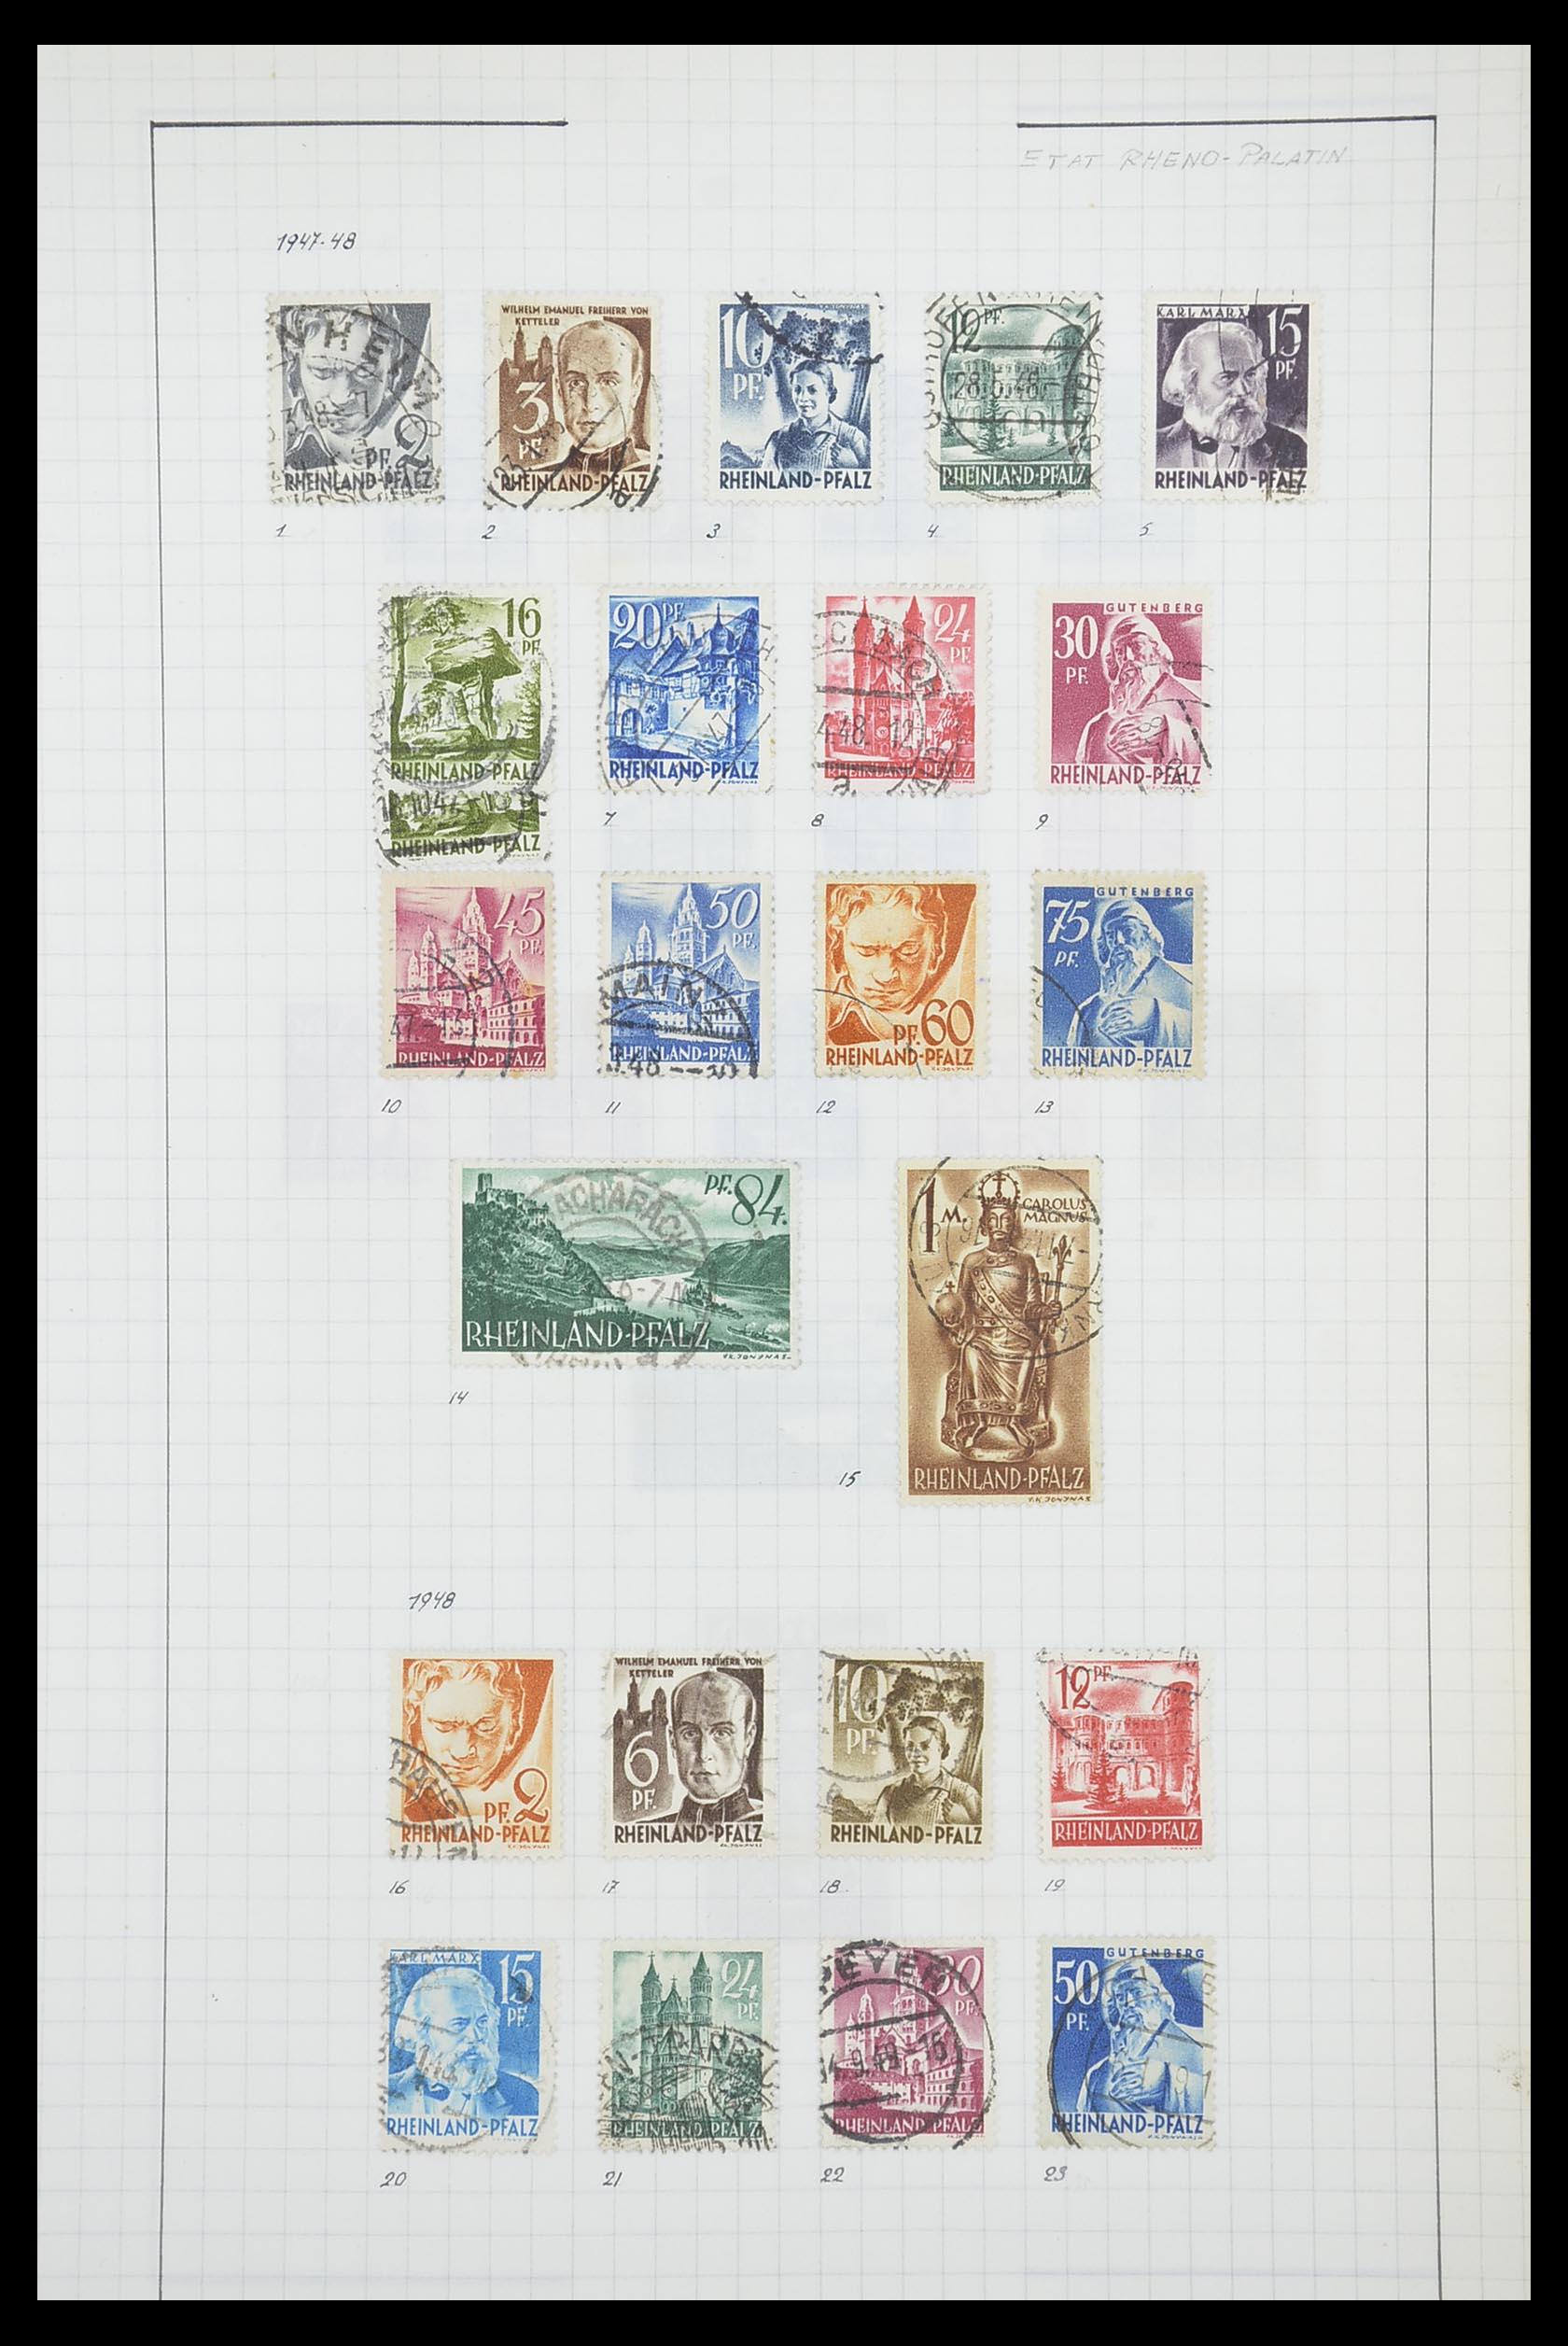 33864 014 - Postzegelverzameling 33864 Franse Zone 1945-1949.